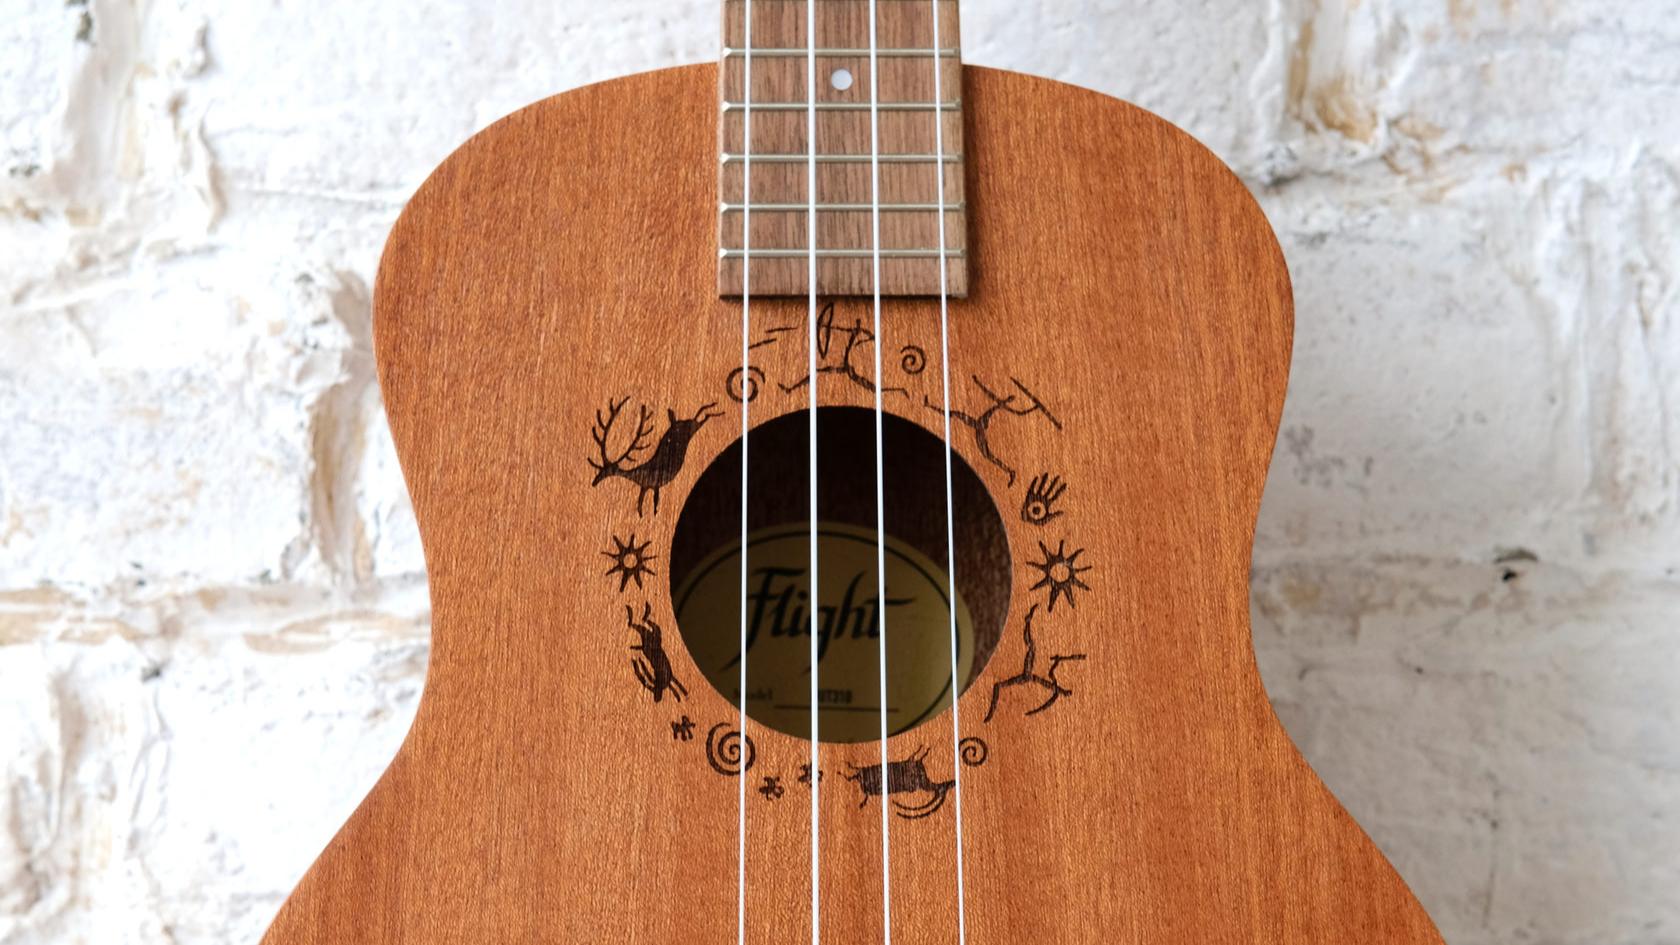 Купить укулеле тенор Flight NUT 310 в магазине ukelovers, ukulele Flight